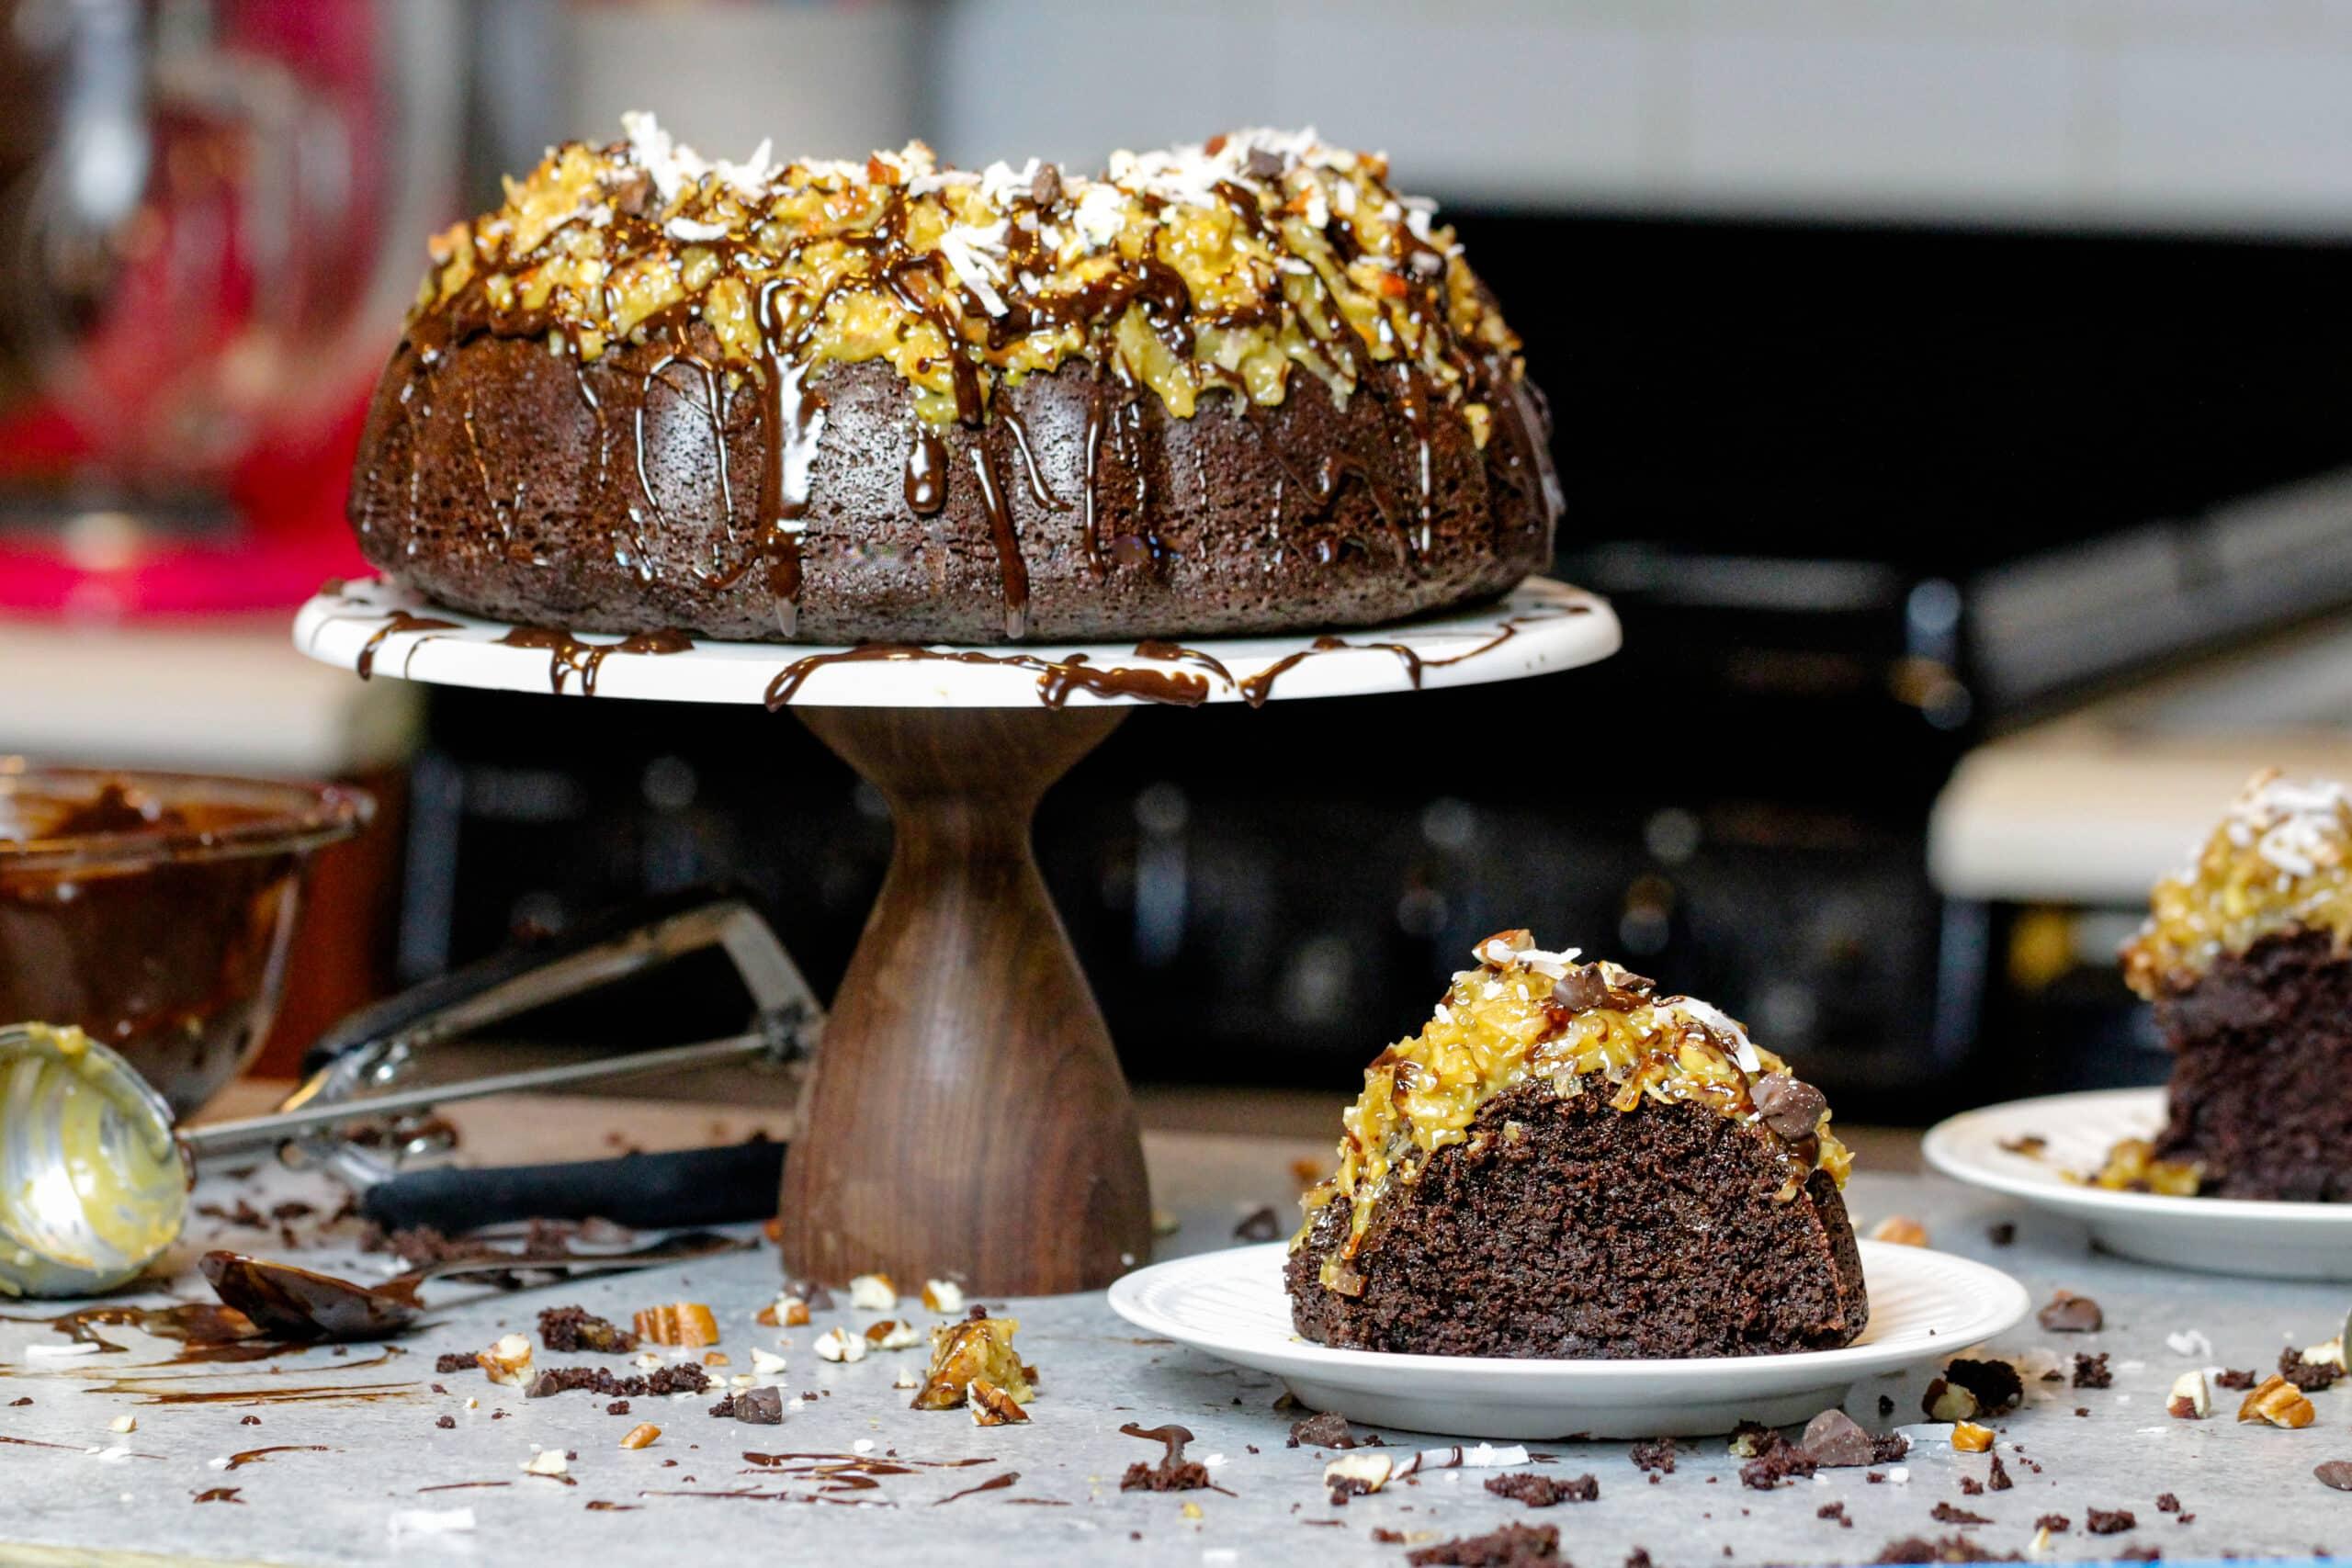 image of german chocolate pound cake decorate with a chocolate glaze